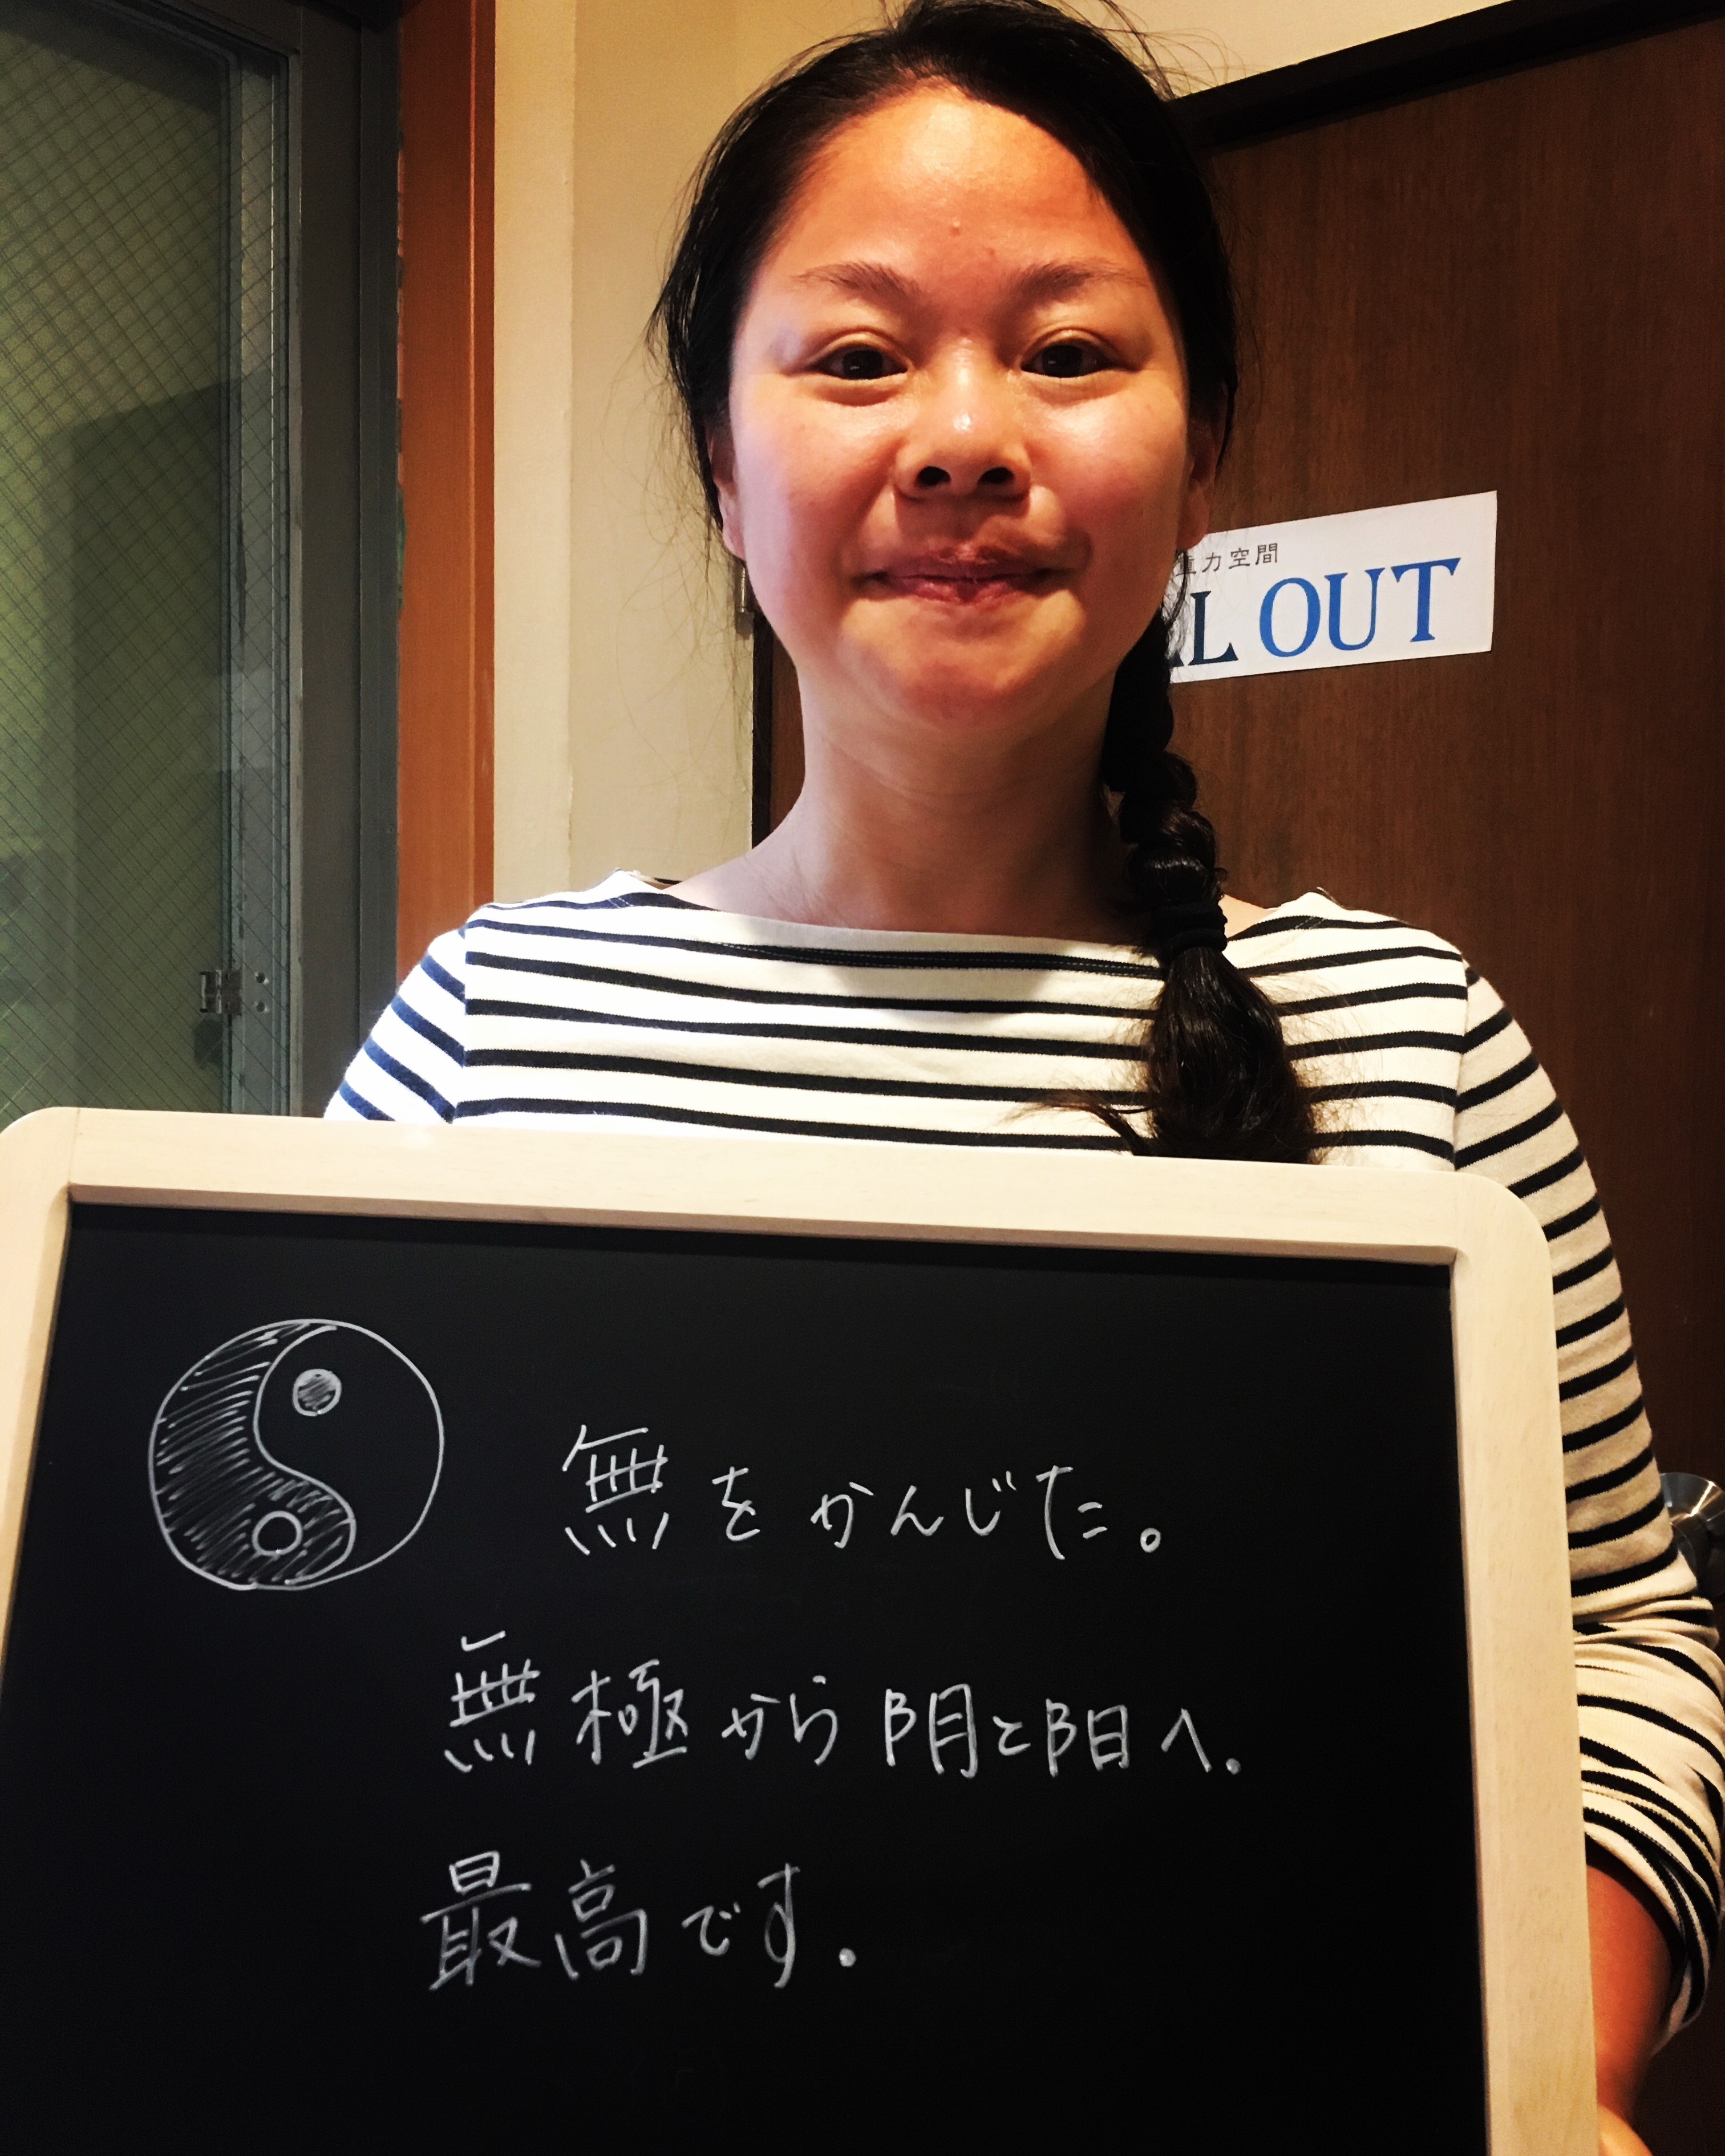 Yさん タンク90分 女性 鍼灸学校教員 無 無極から陰と陽へ 最高 埼玉県